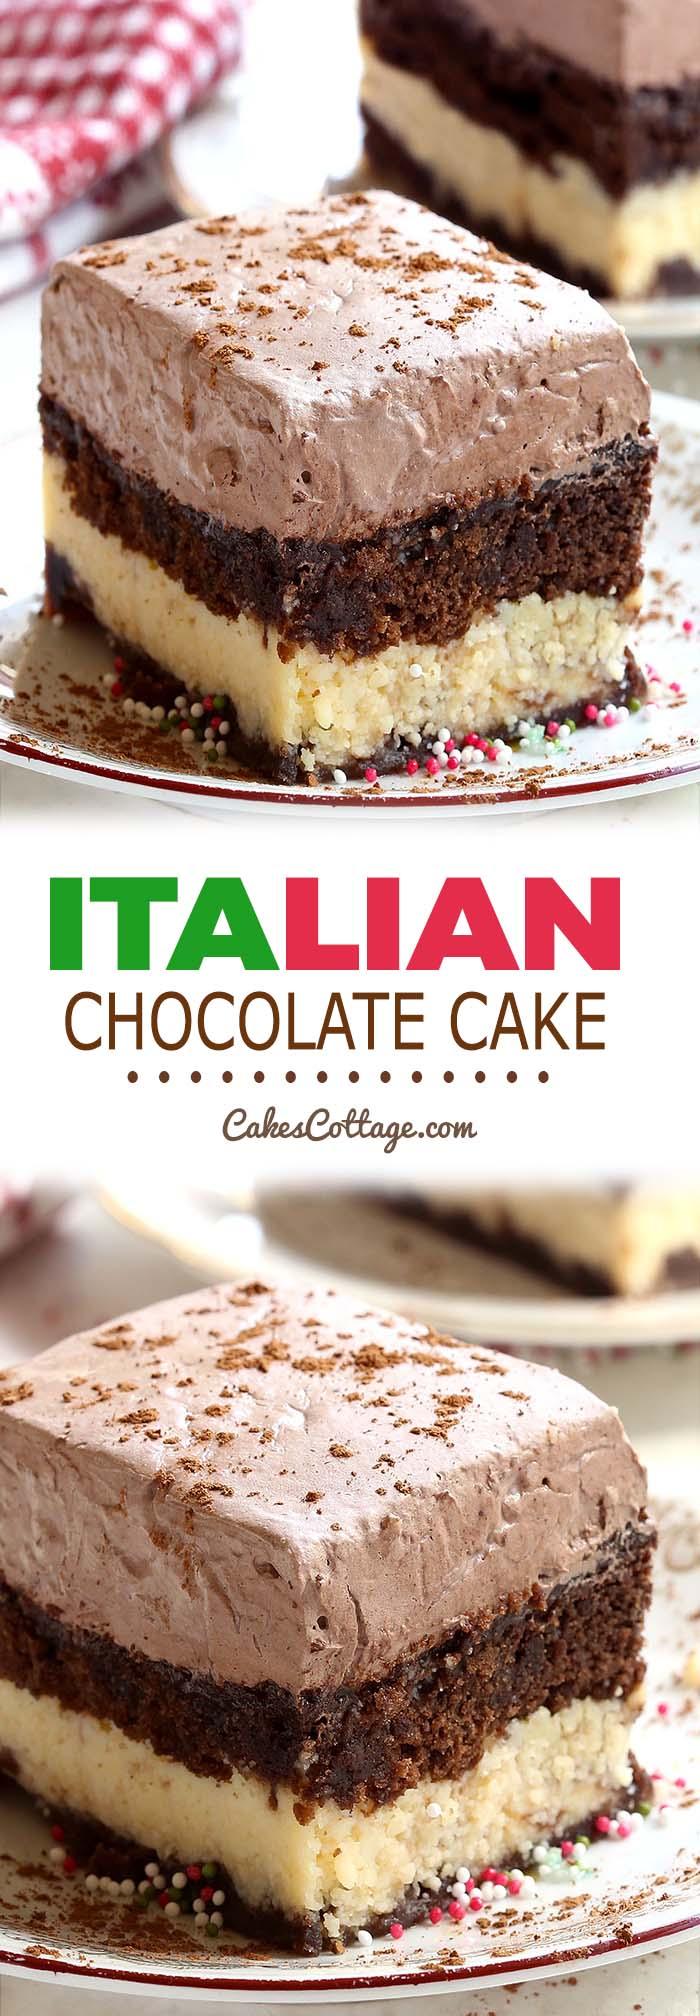 Italian Chocolate Cake | Recipe | Italian chocolate ...